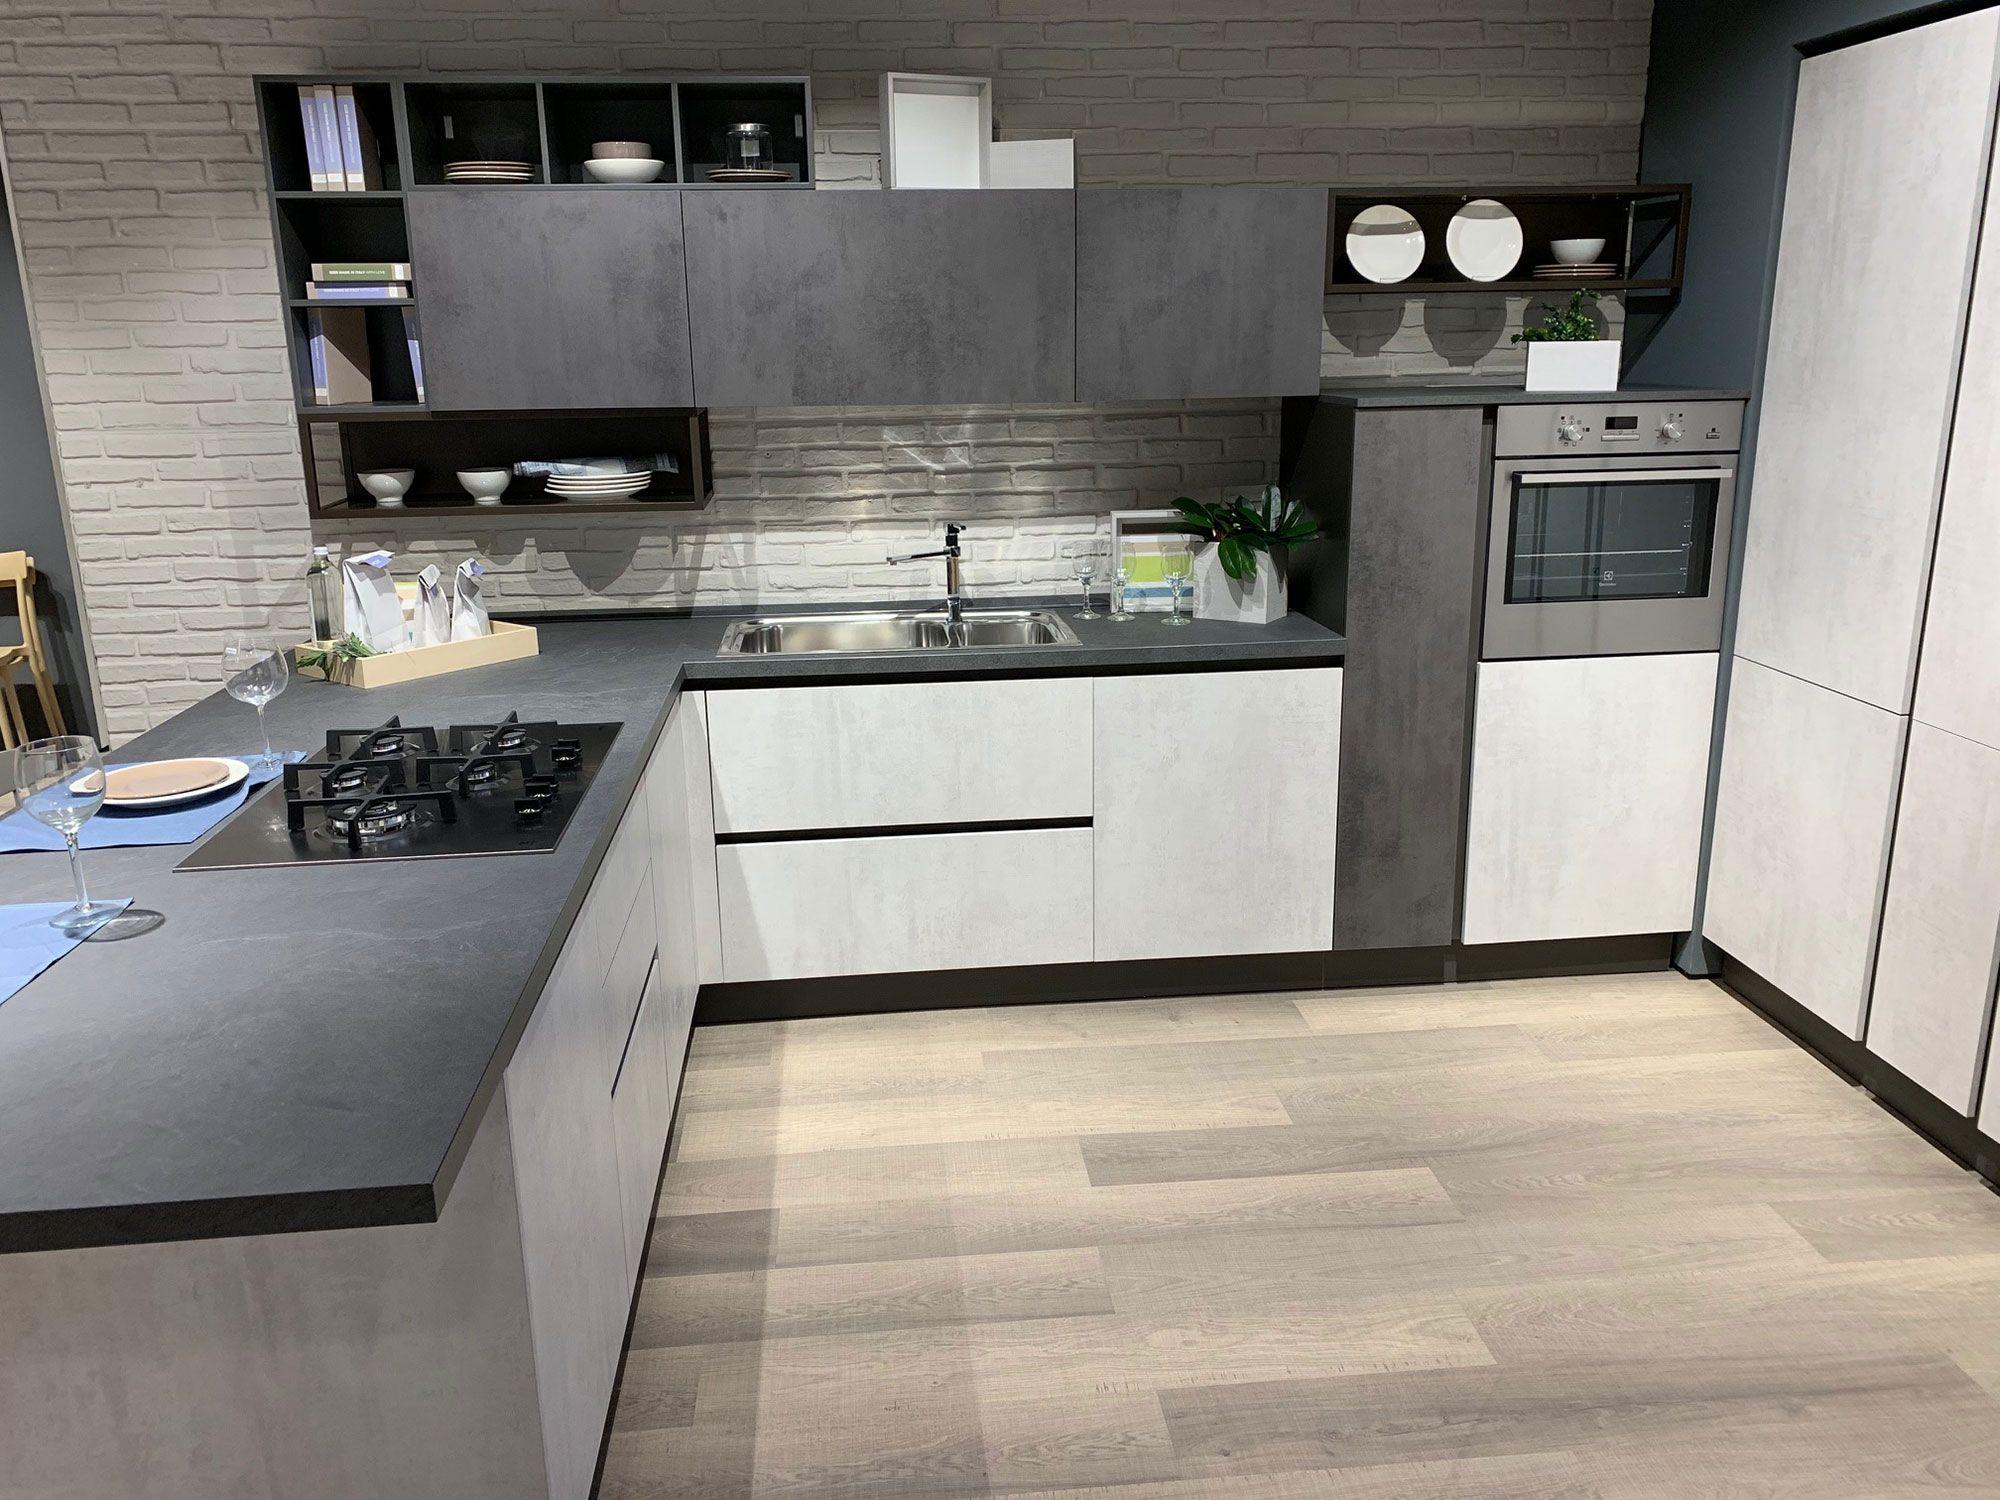 Cucina Creo Kitchens Mod Tablet Neck Arredo Interni Cucina Arredamento Sala E Cucina Interni Della Cucina